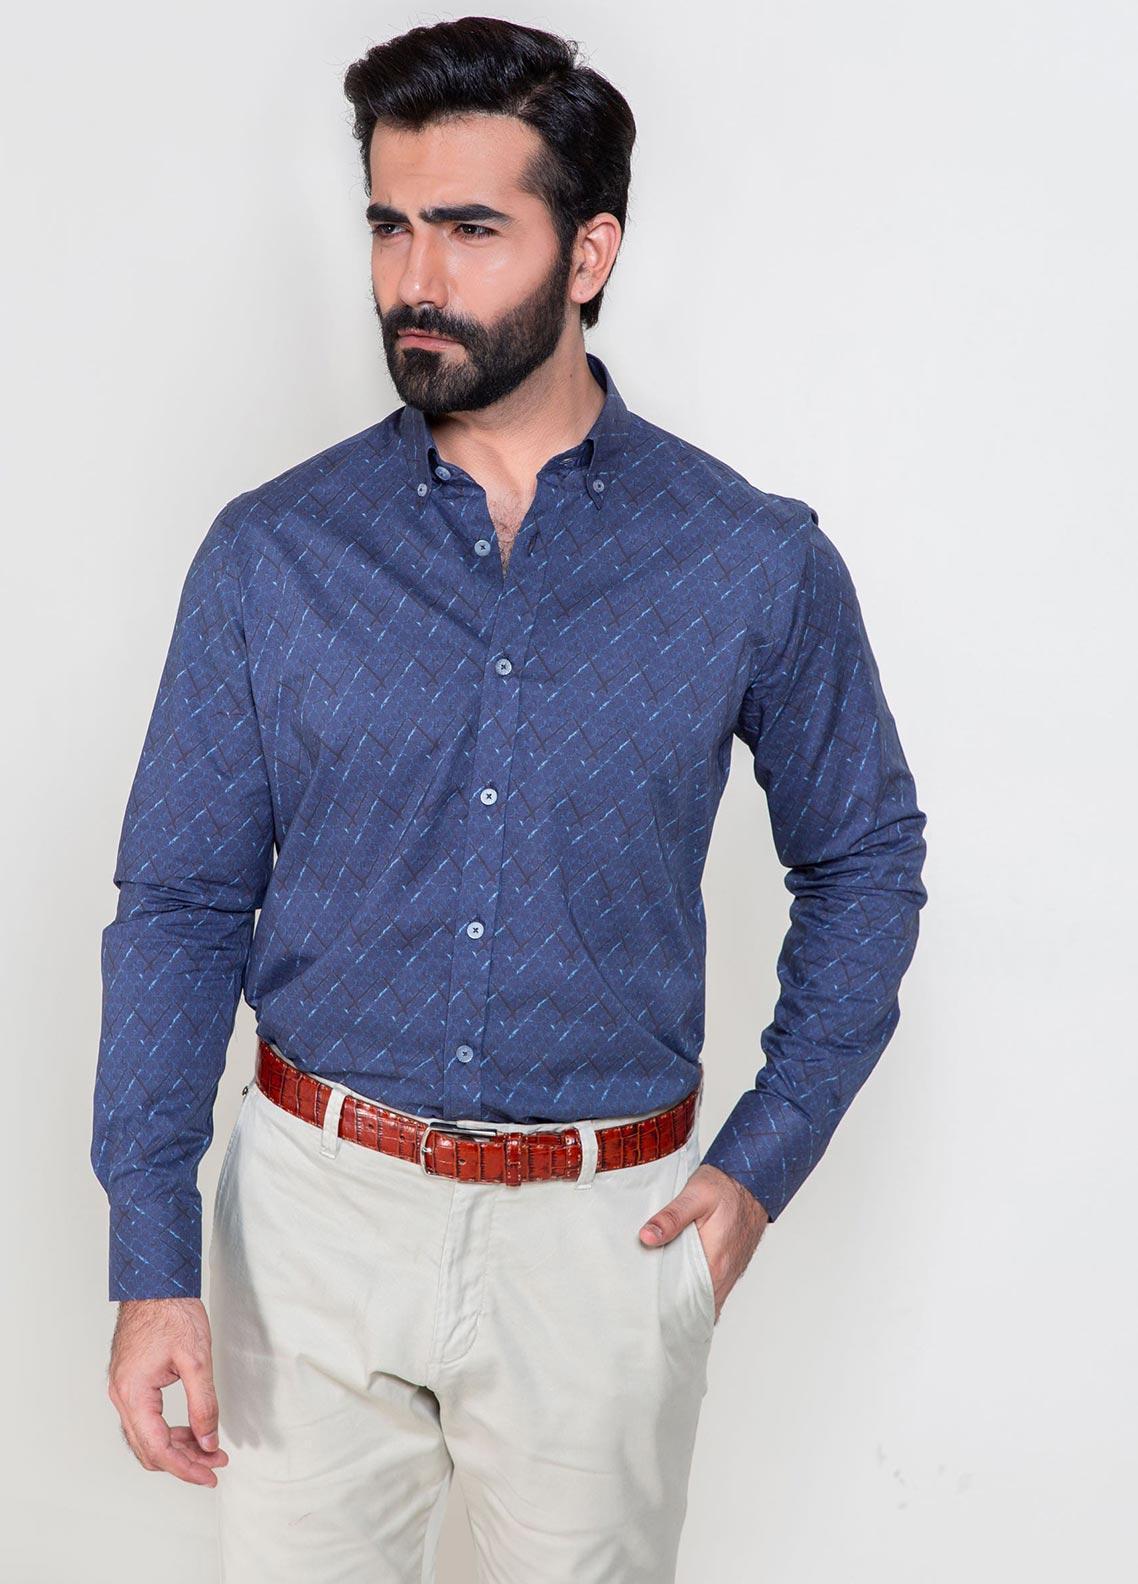 Brumano Cotton Formal Shirts for Men -  BRM-861